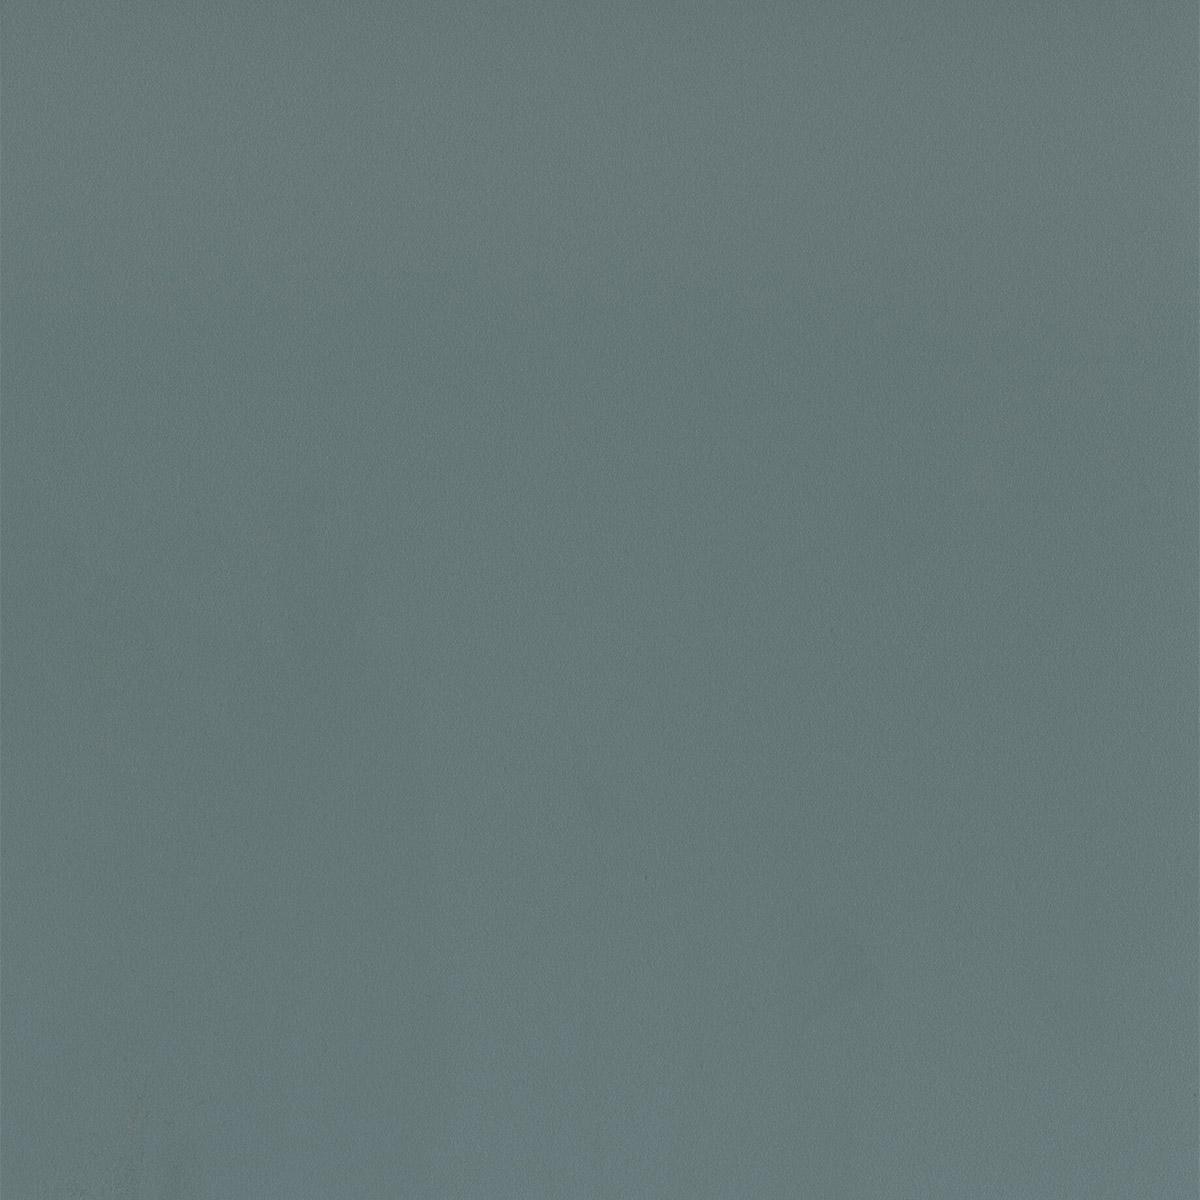 HF1963 VL Granite Grey